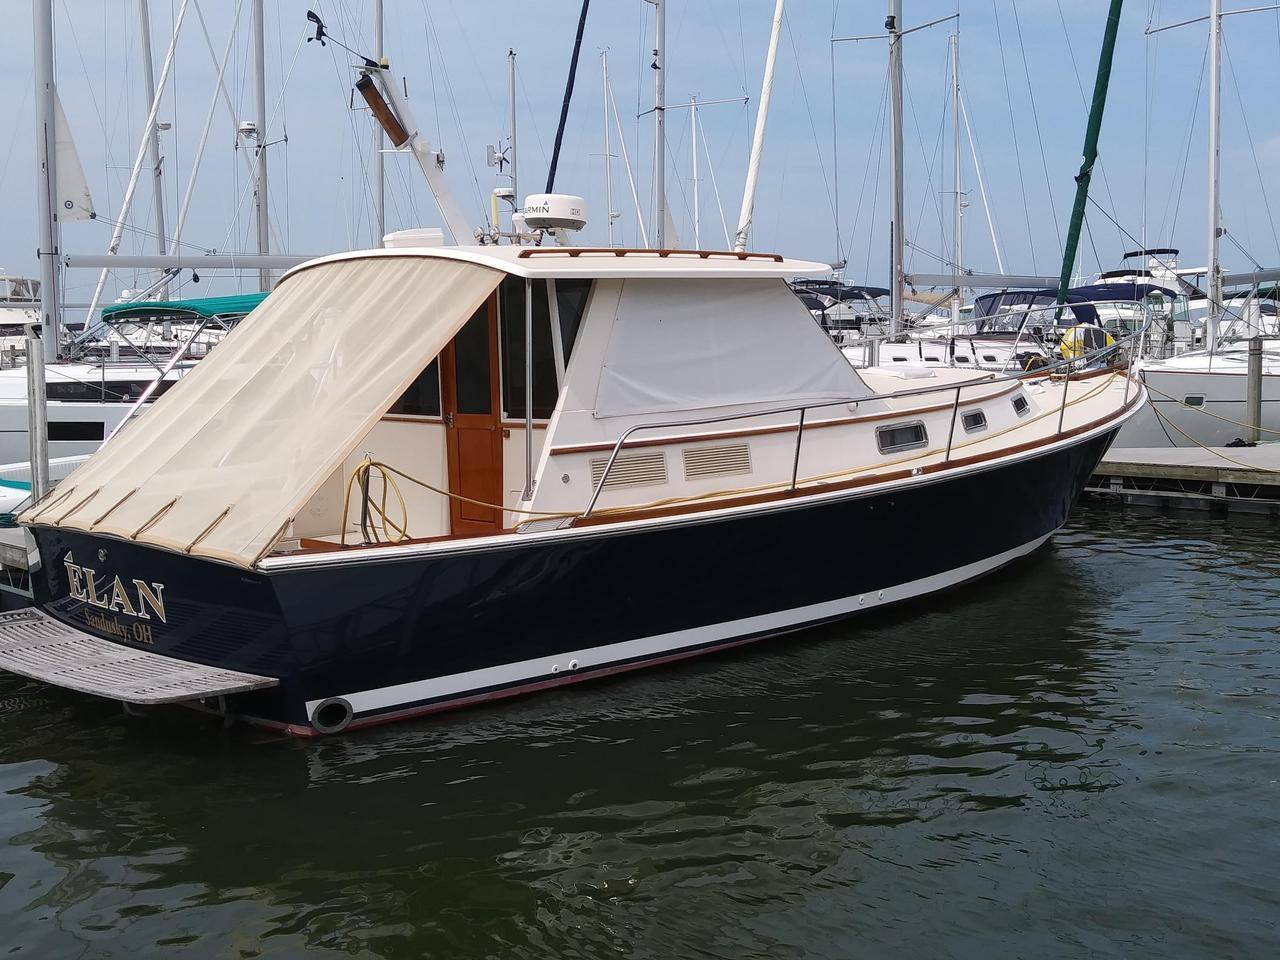 2004 Used Bruckmann Bluestar 36 6 Downeast Fishing Boat For Sale